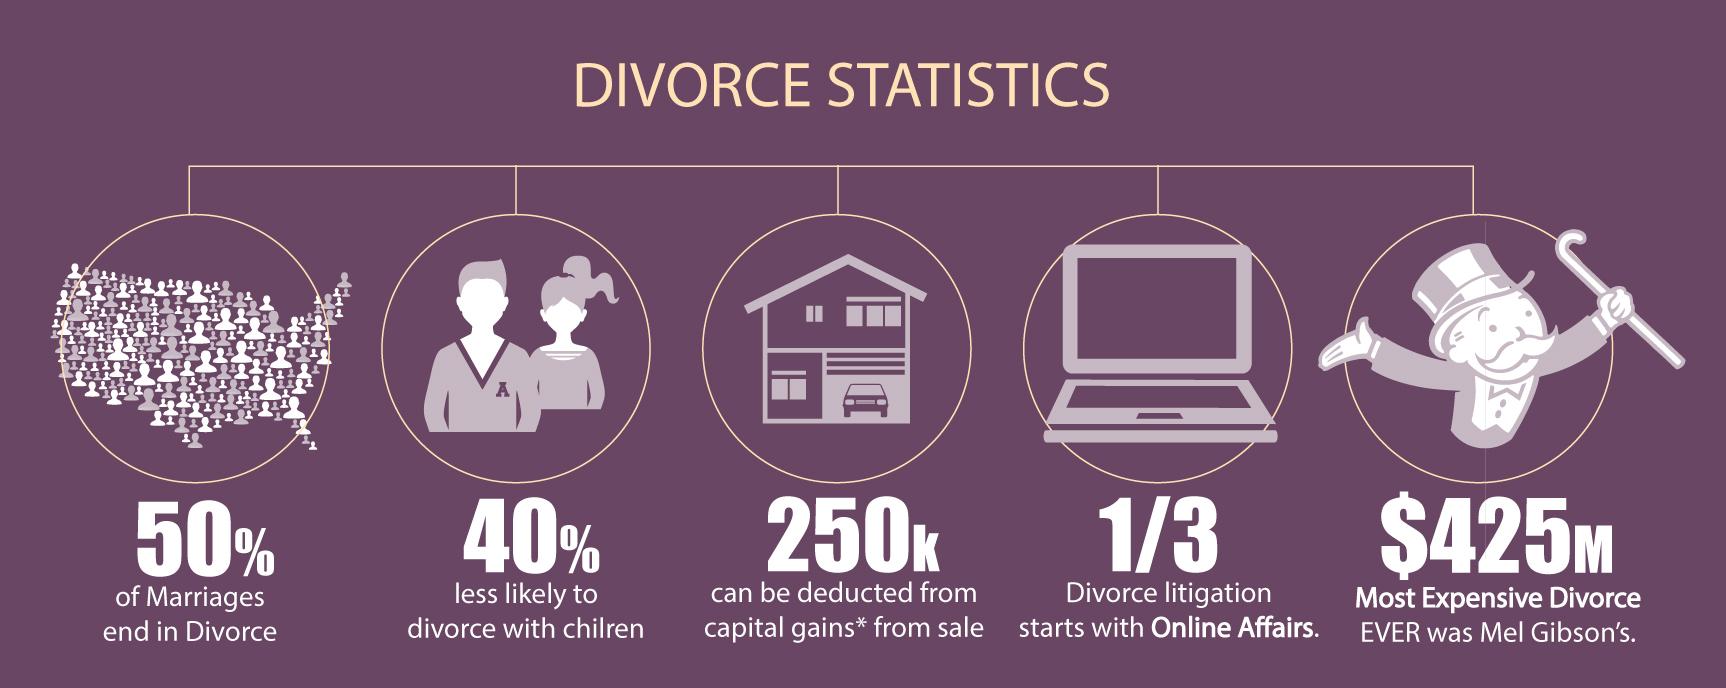 divorce-talktopaul-paul-argueta-divorce-real-estate-agent-stats